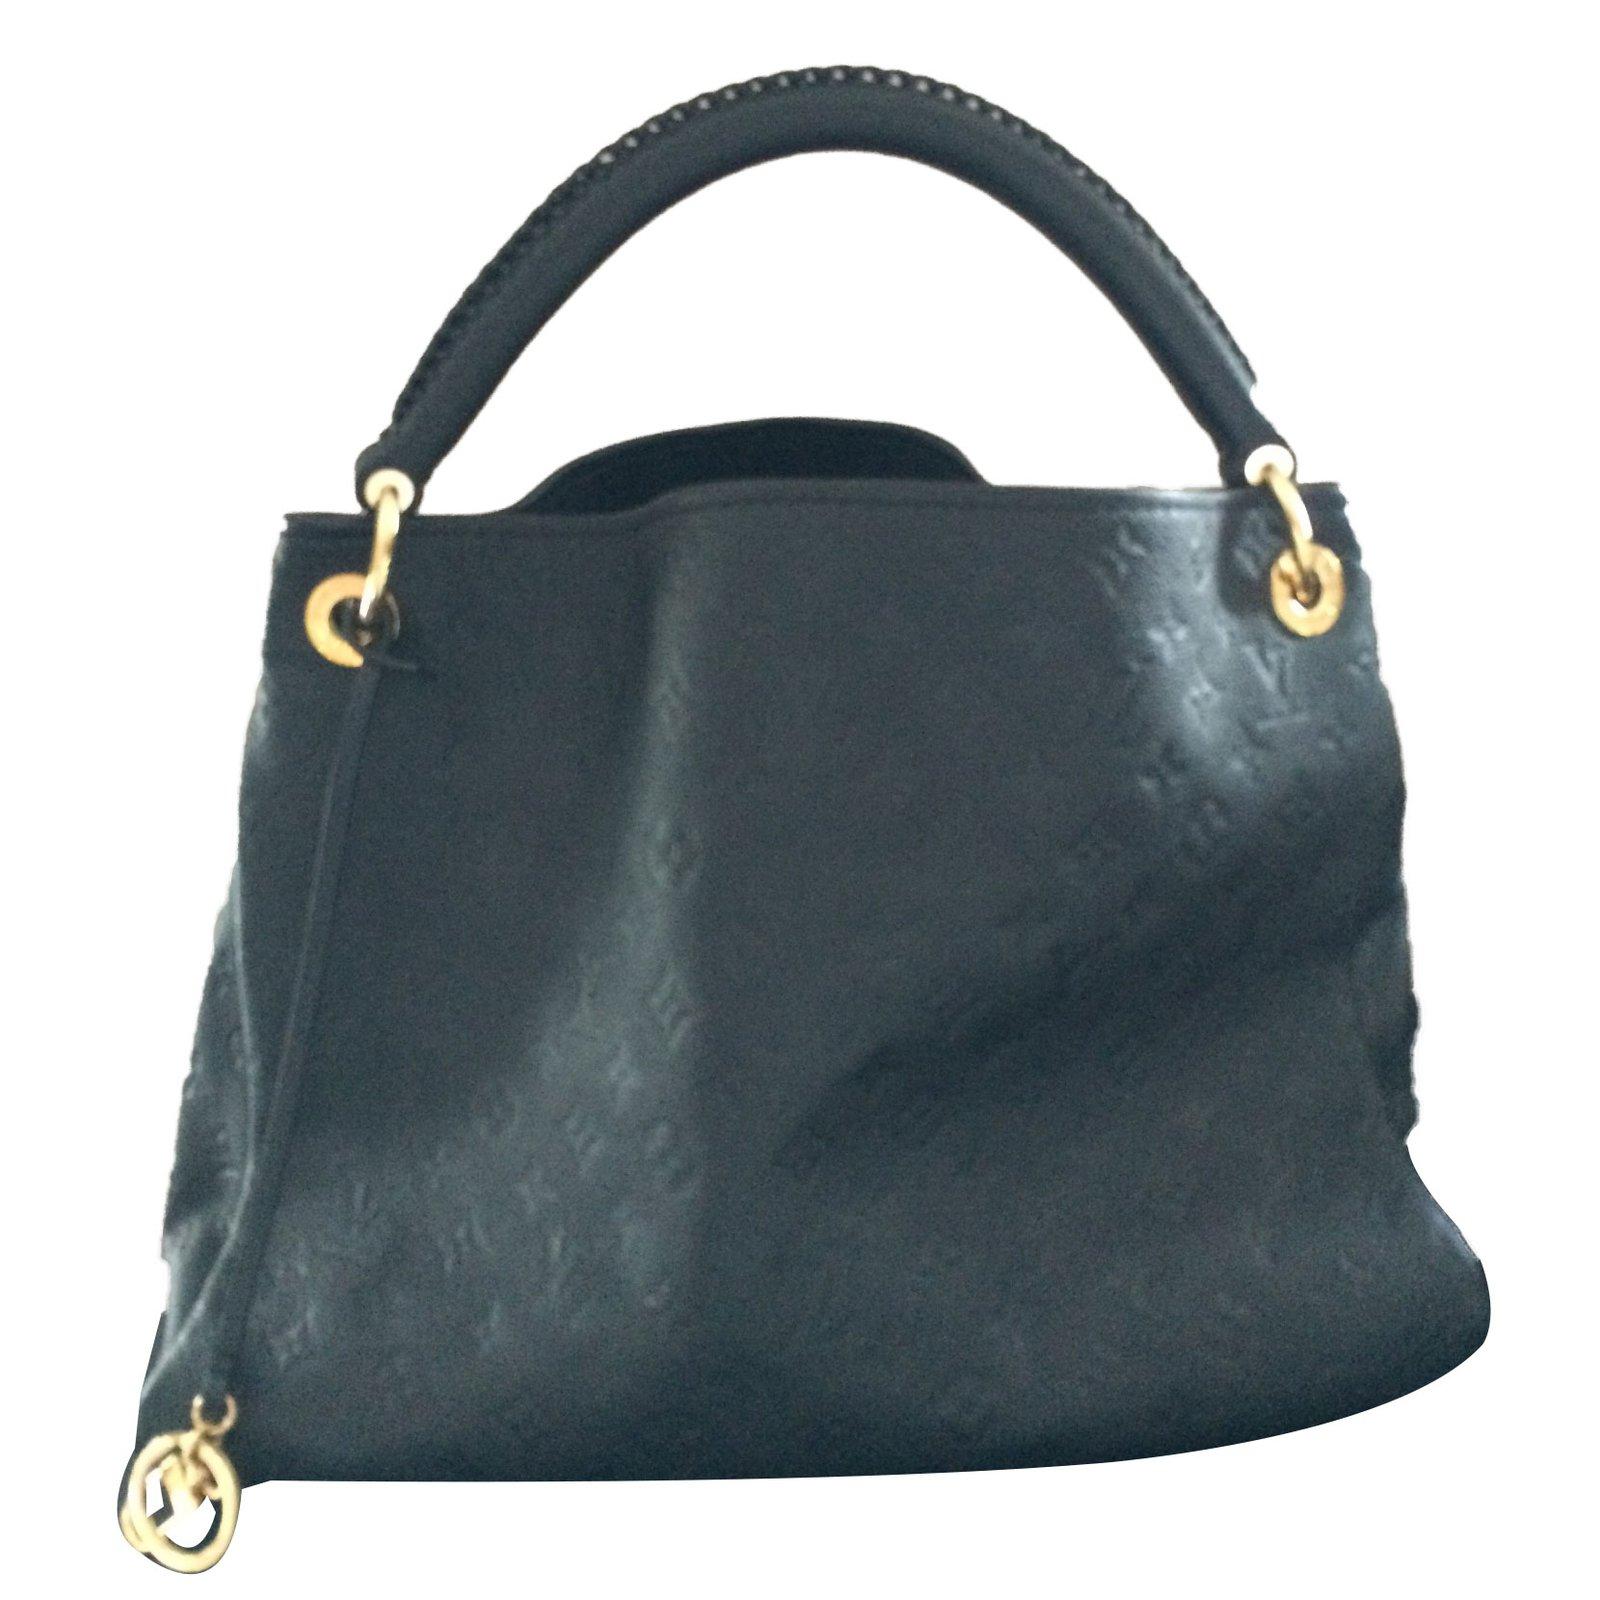 e3b71b97611 Louis Vuitton ARTSY MM Handbags Leather Black ref.65116 - Joli Closet